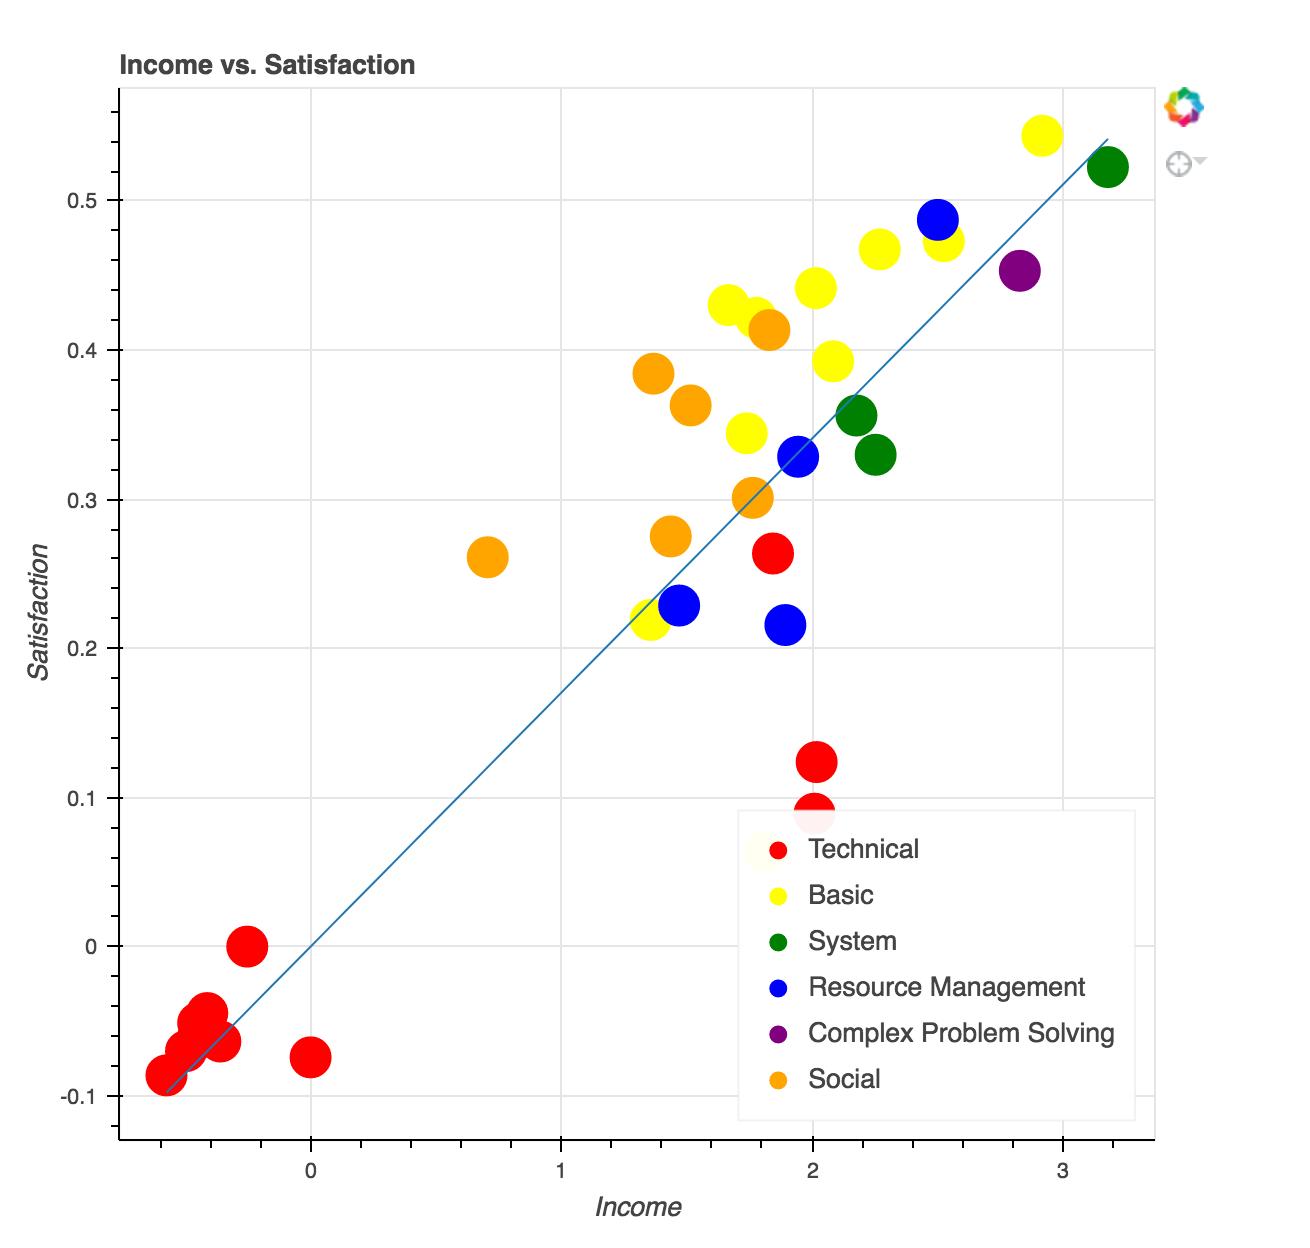 Income vs Satisfaction